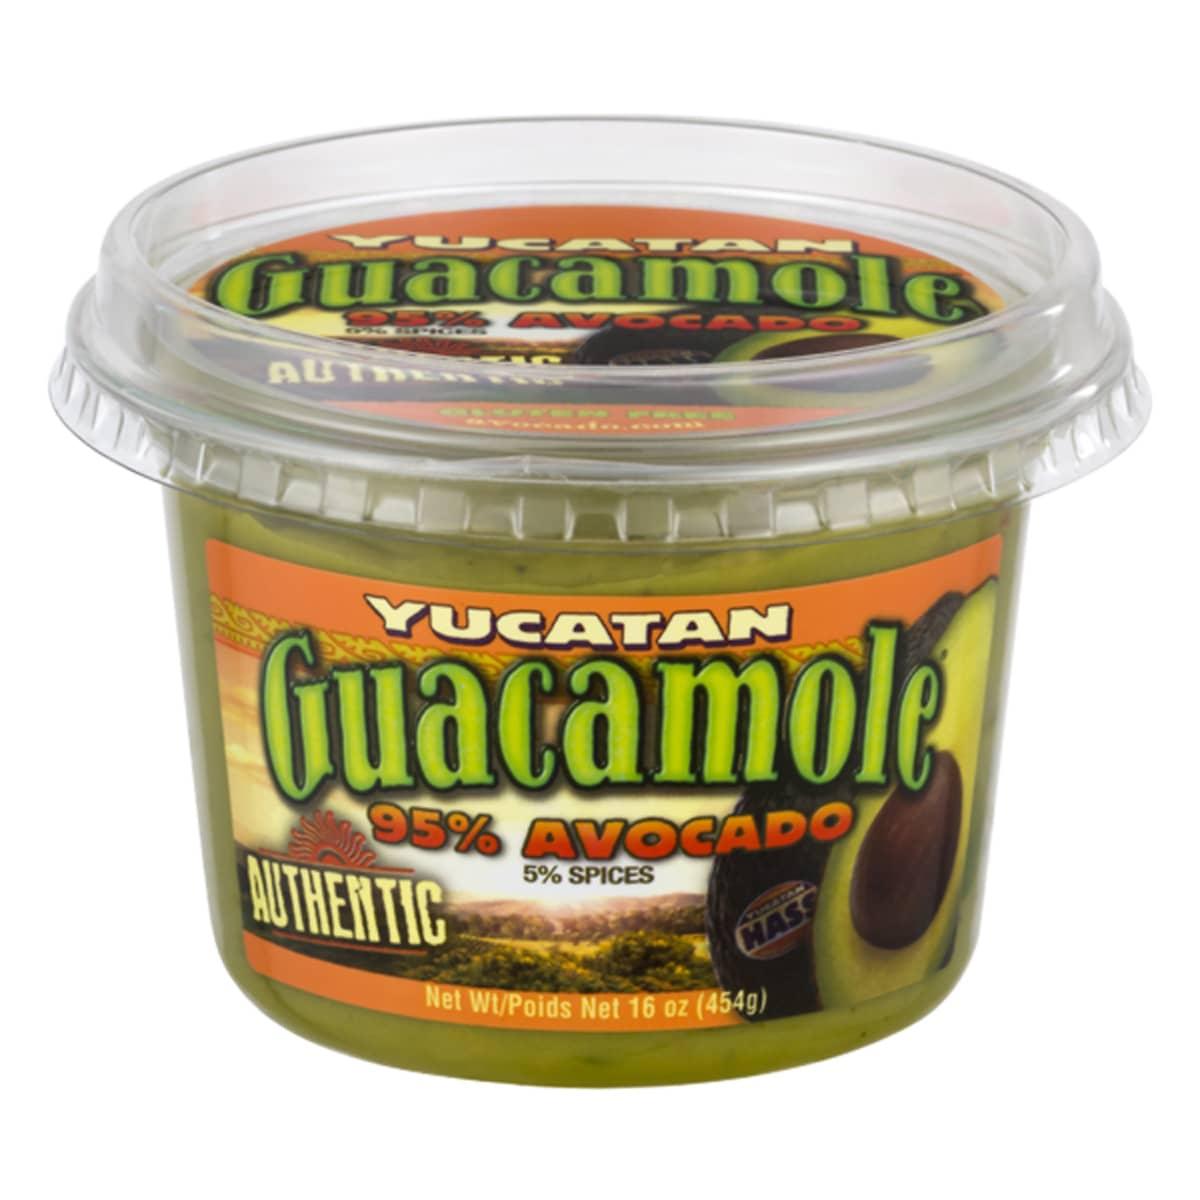 Best Guacamole Brand Buy Kitchn